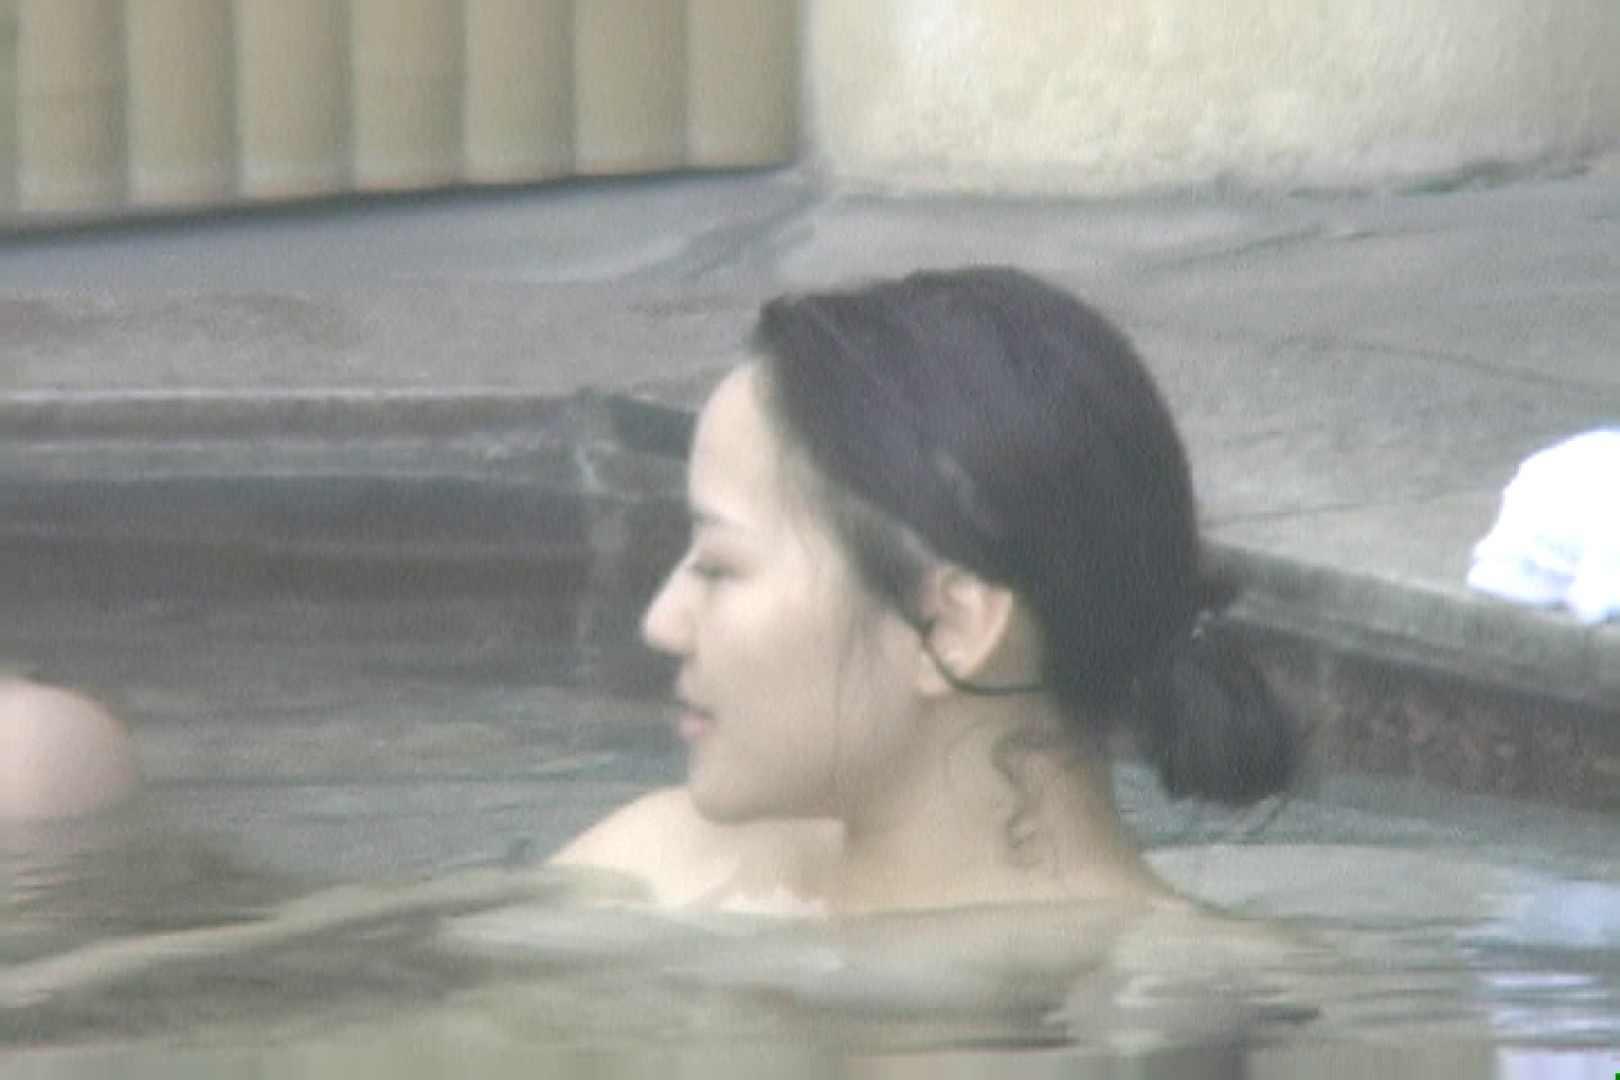 Aquaな露天風呂Vol.689 露天風呂 セックス無修正動画無料 50連発 20